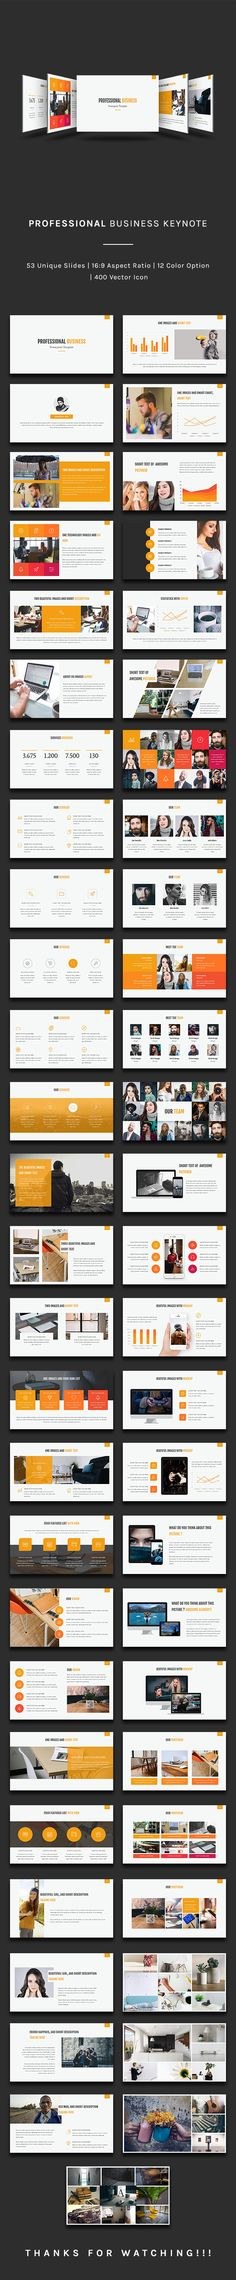 Professional Business Keynote Template - 50+ Unique Creative Slides, 400 Vector Icon